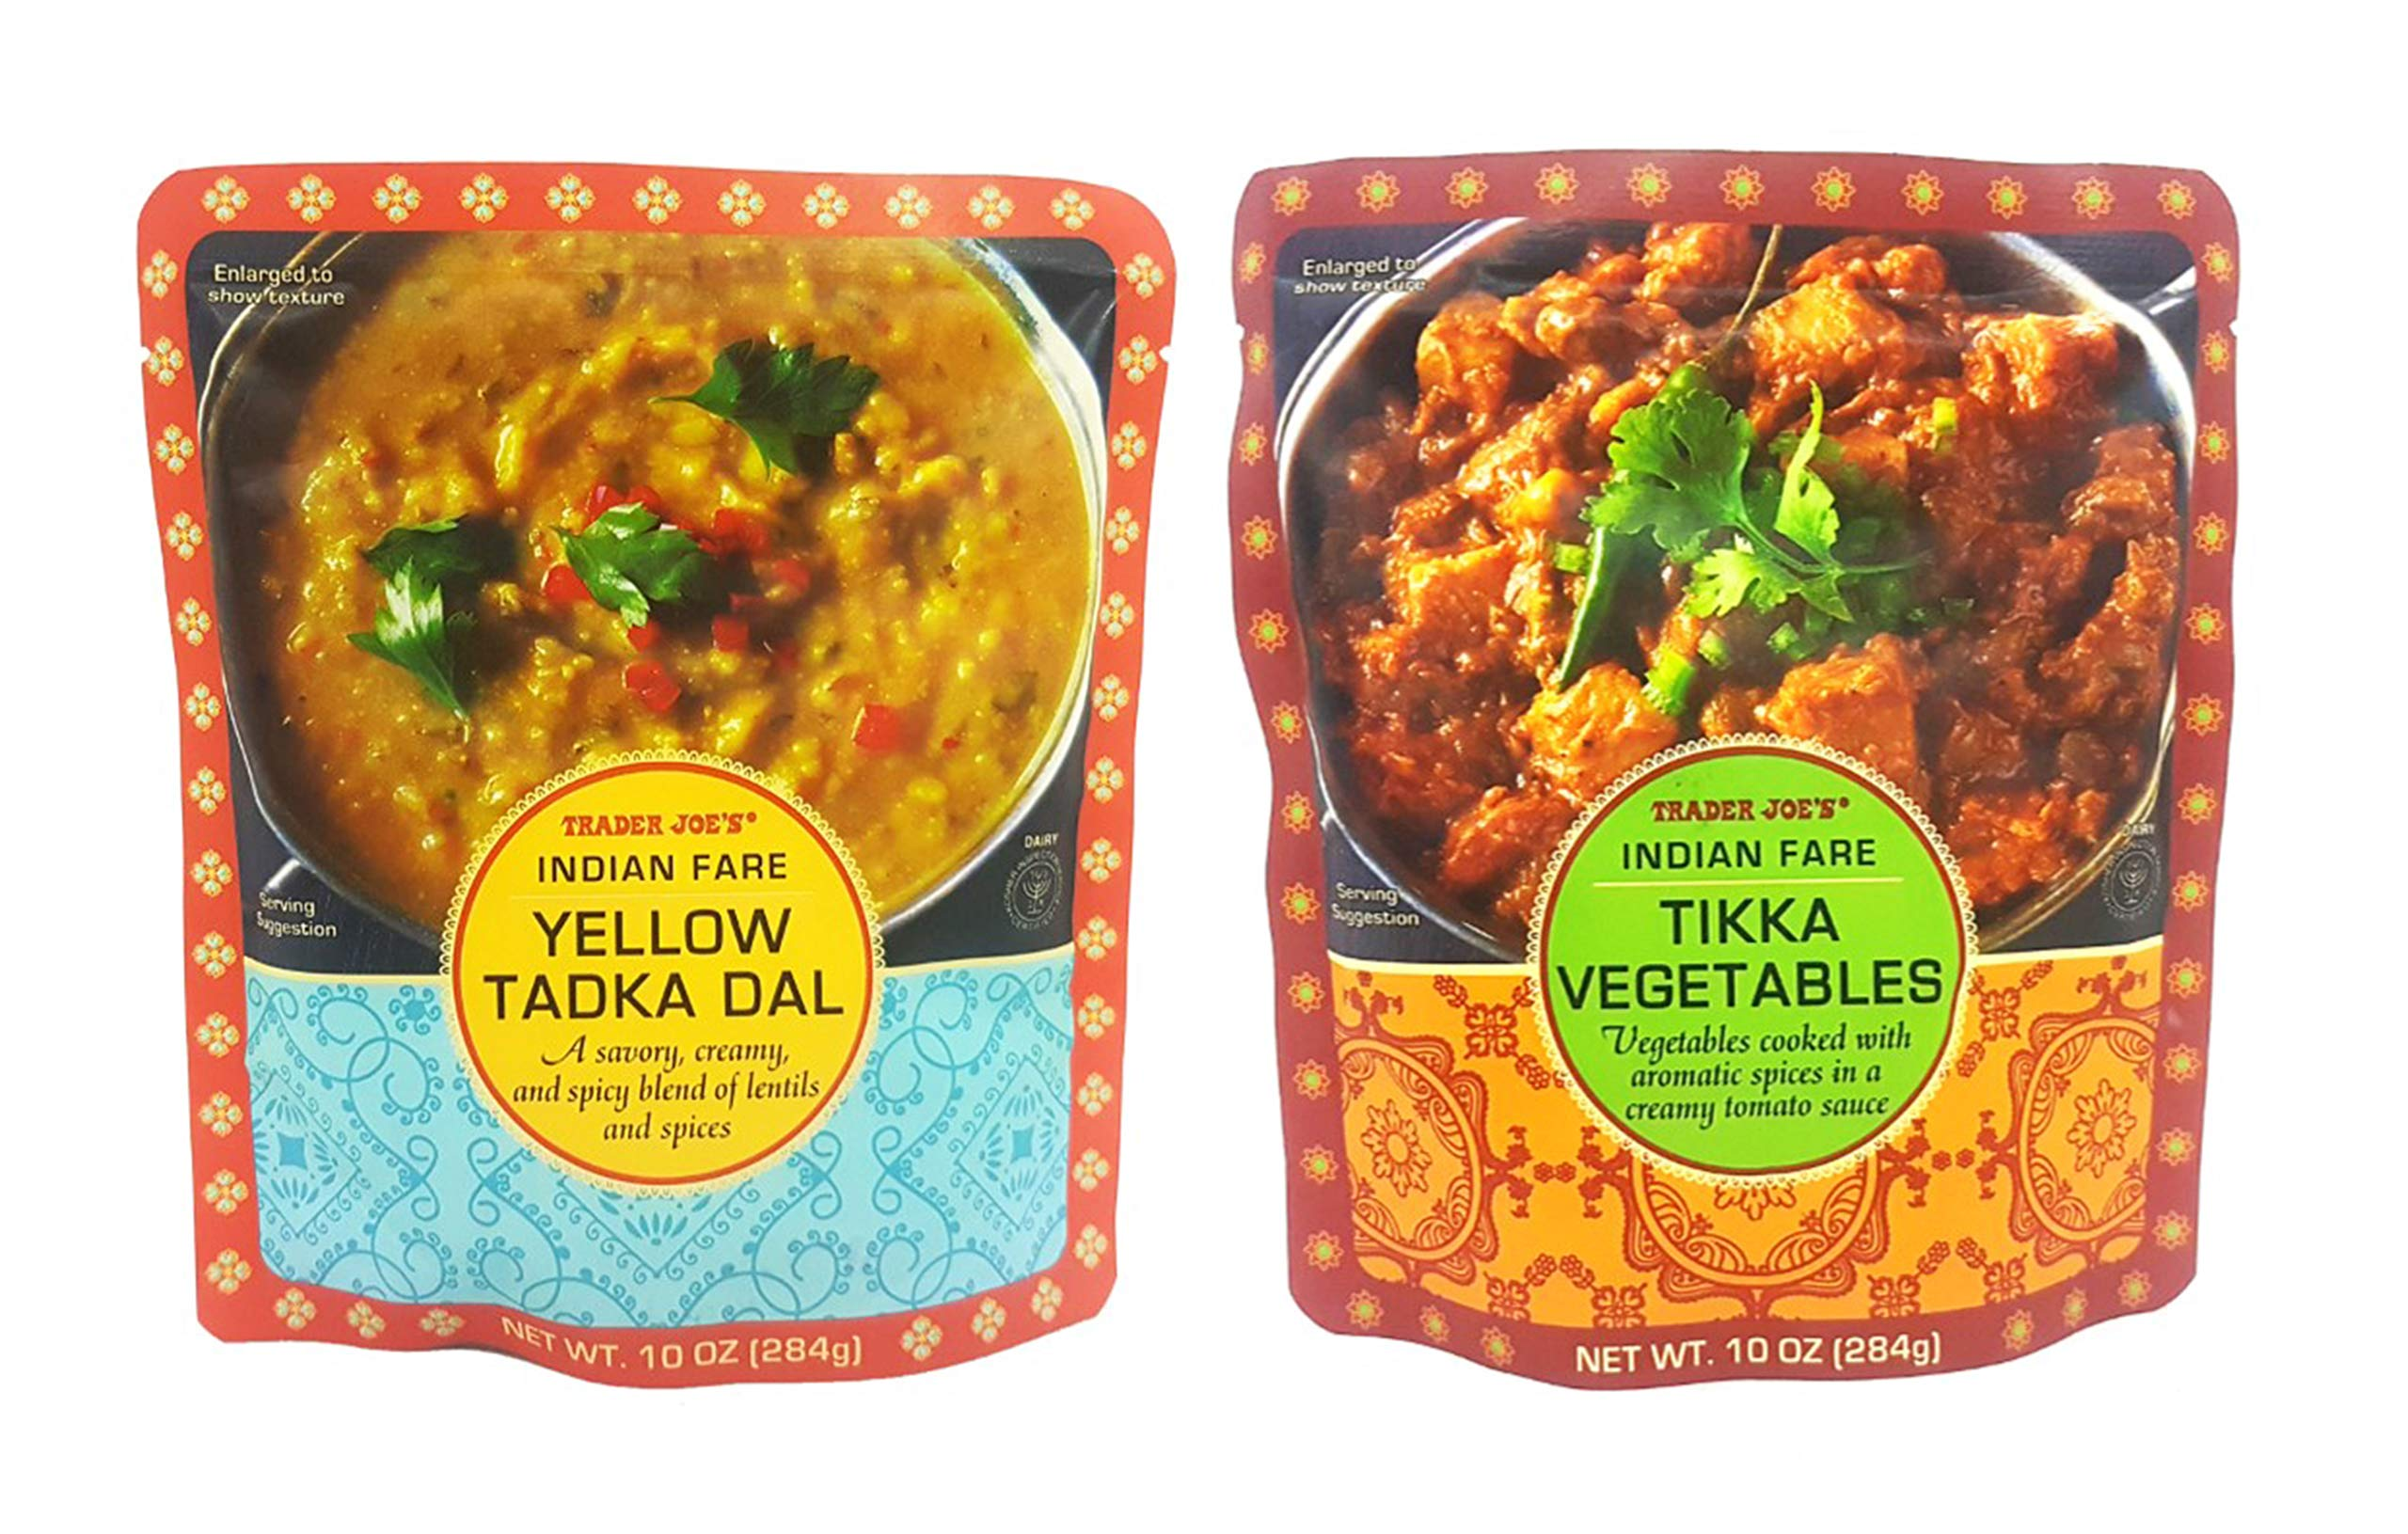 Trader Joe's Indian Fare Combo Yellow Tadka Dal and Tikka Vegetables 10 Oz. (Pack of 2)